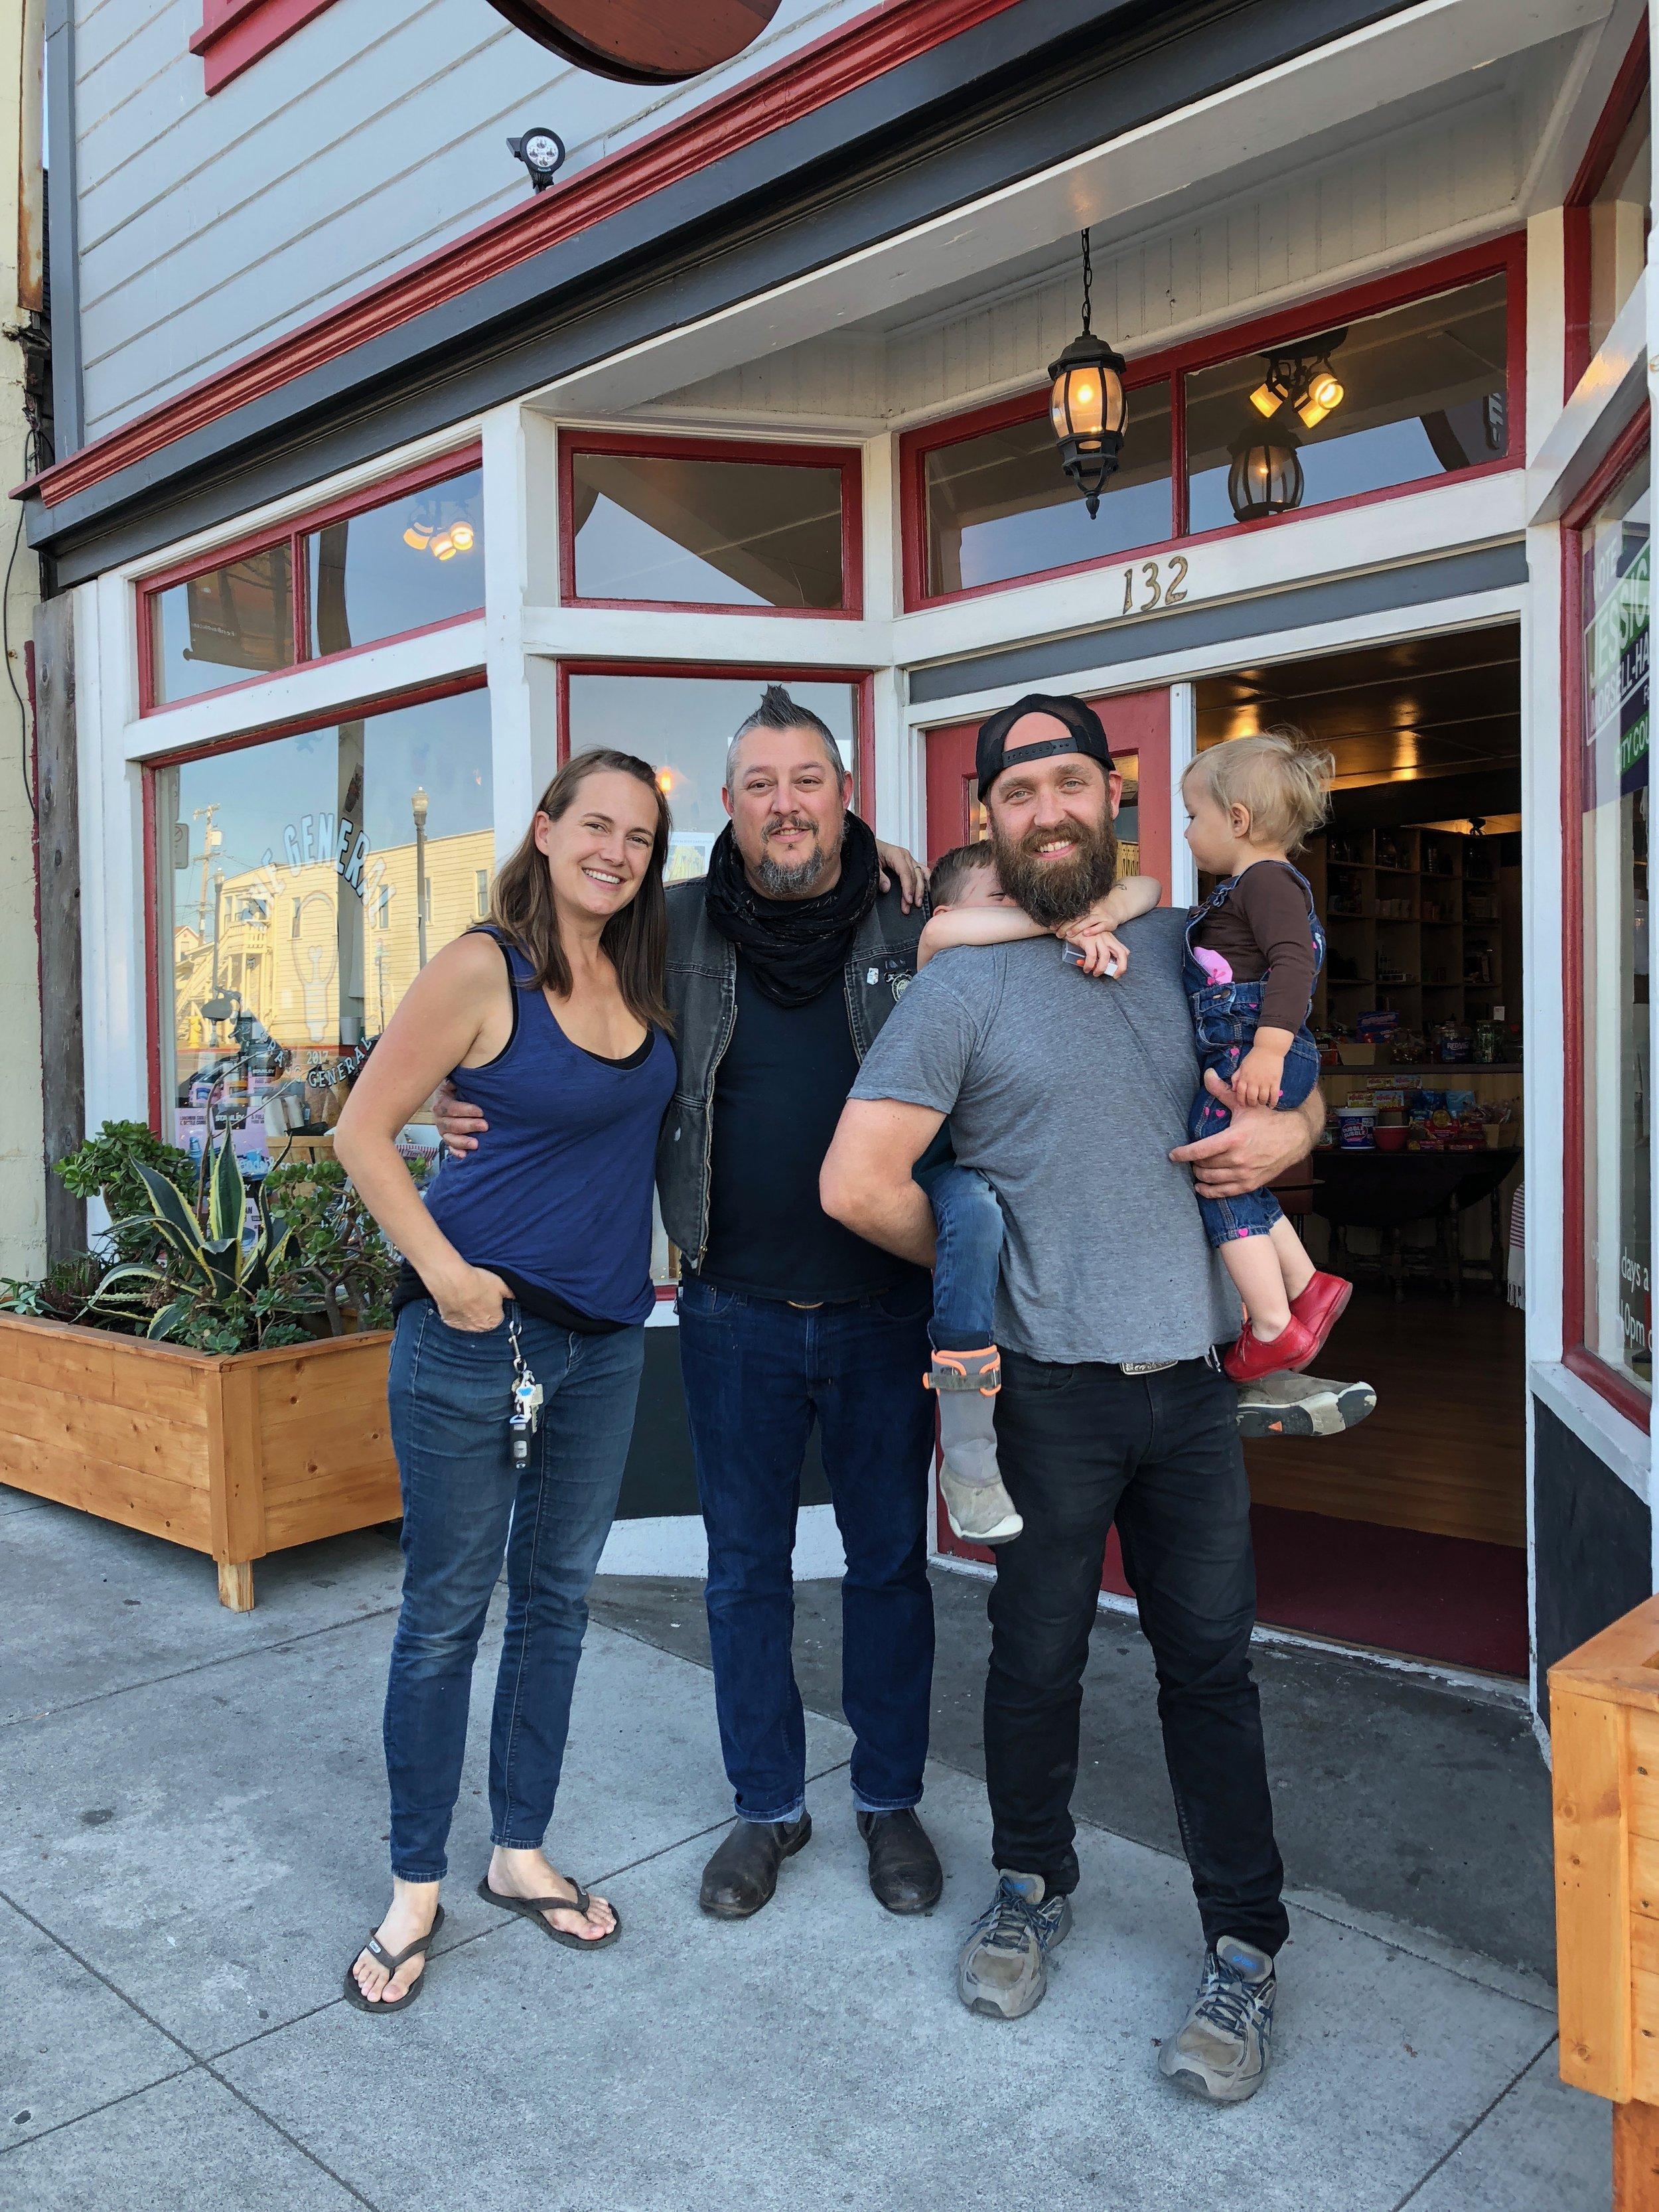 Proprietors Jessica, Mikael & Matty with the wild imps